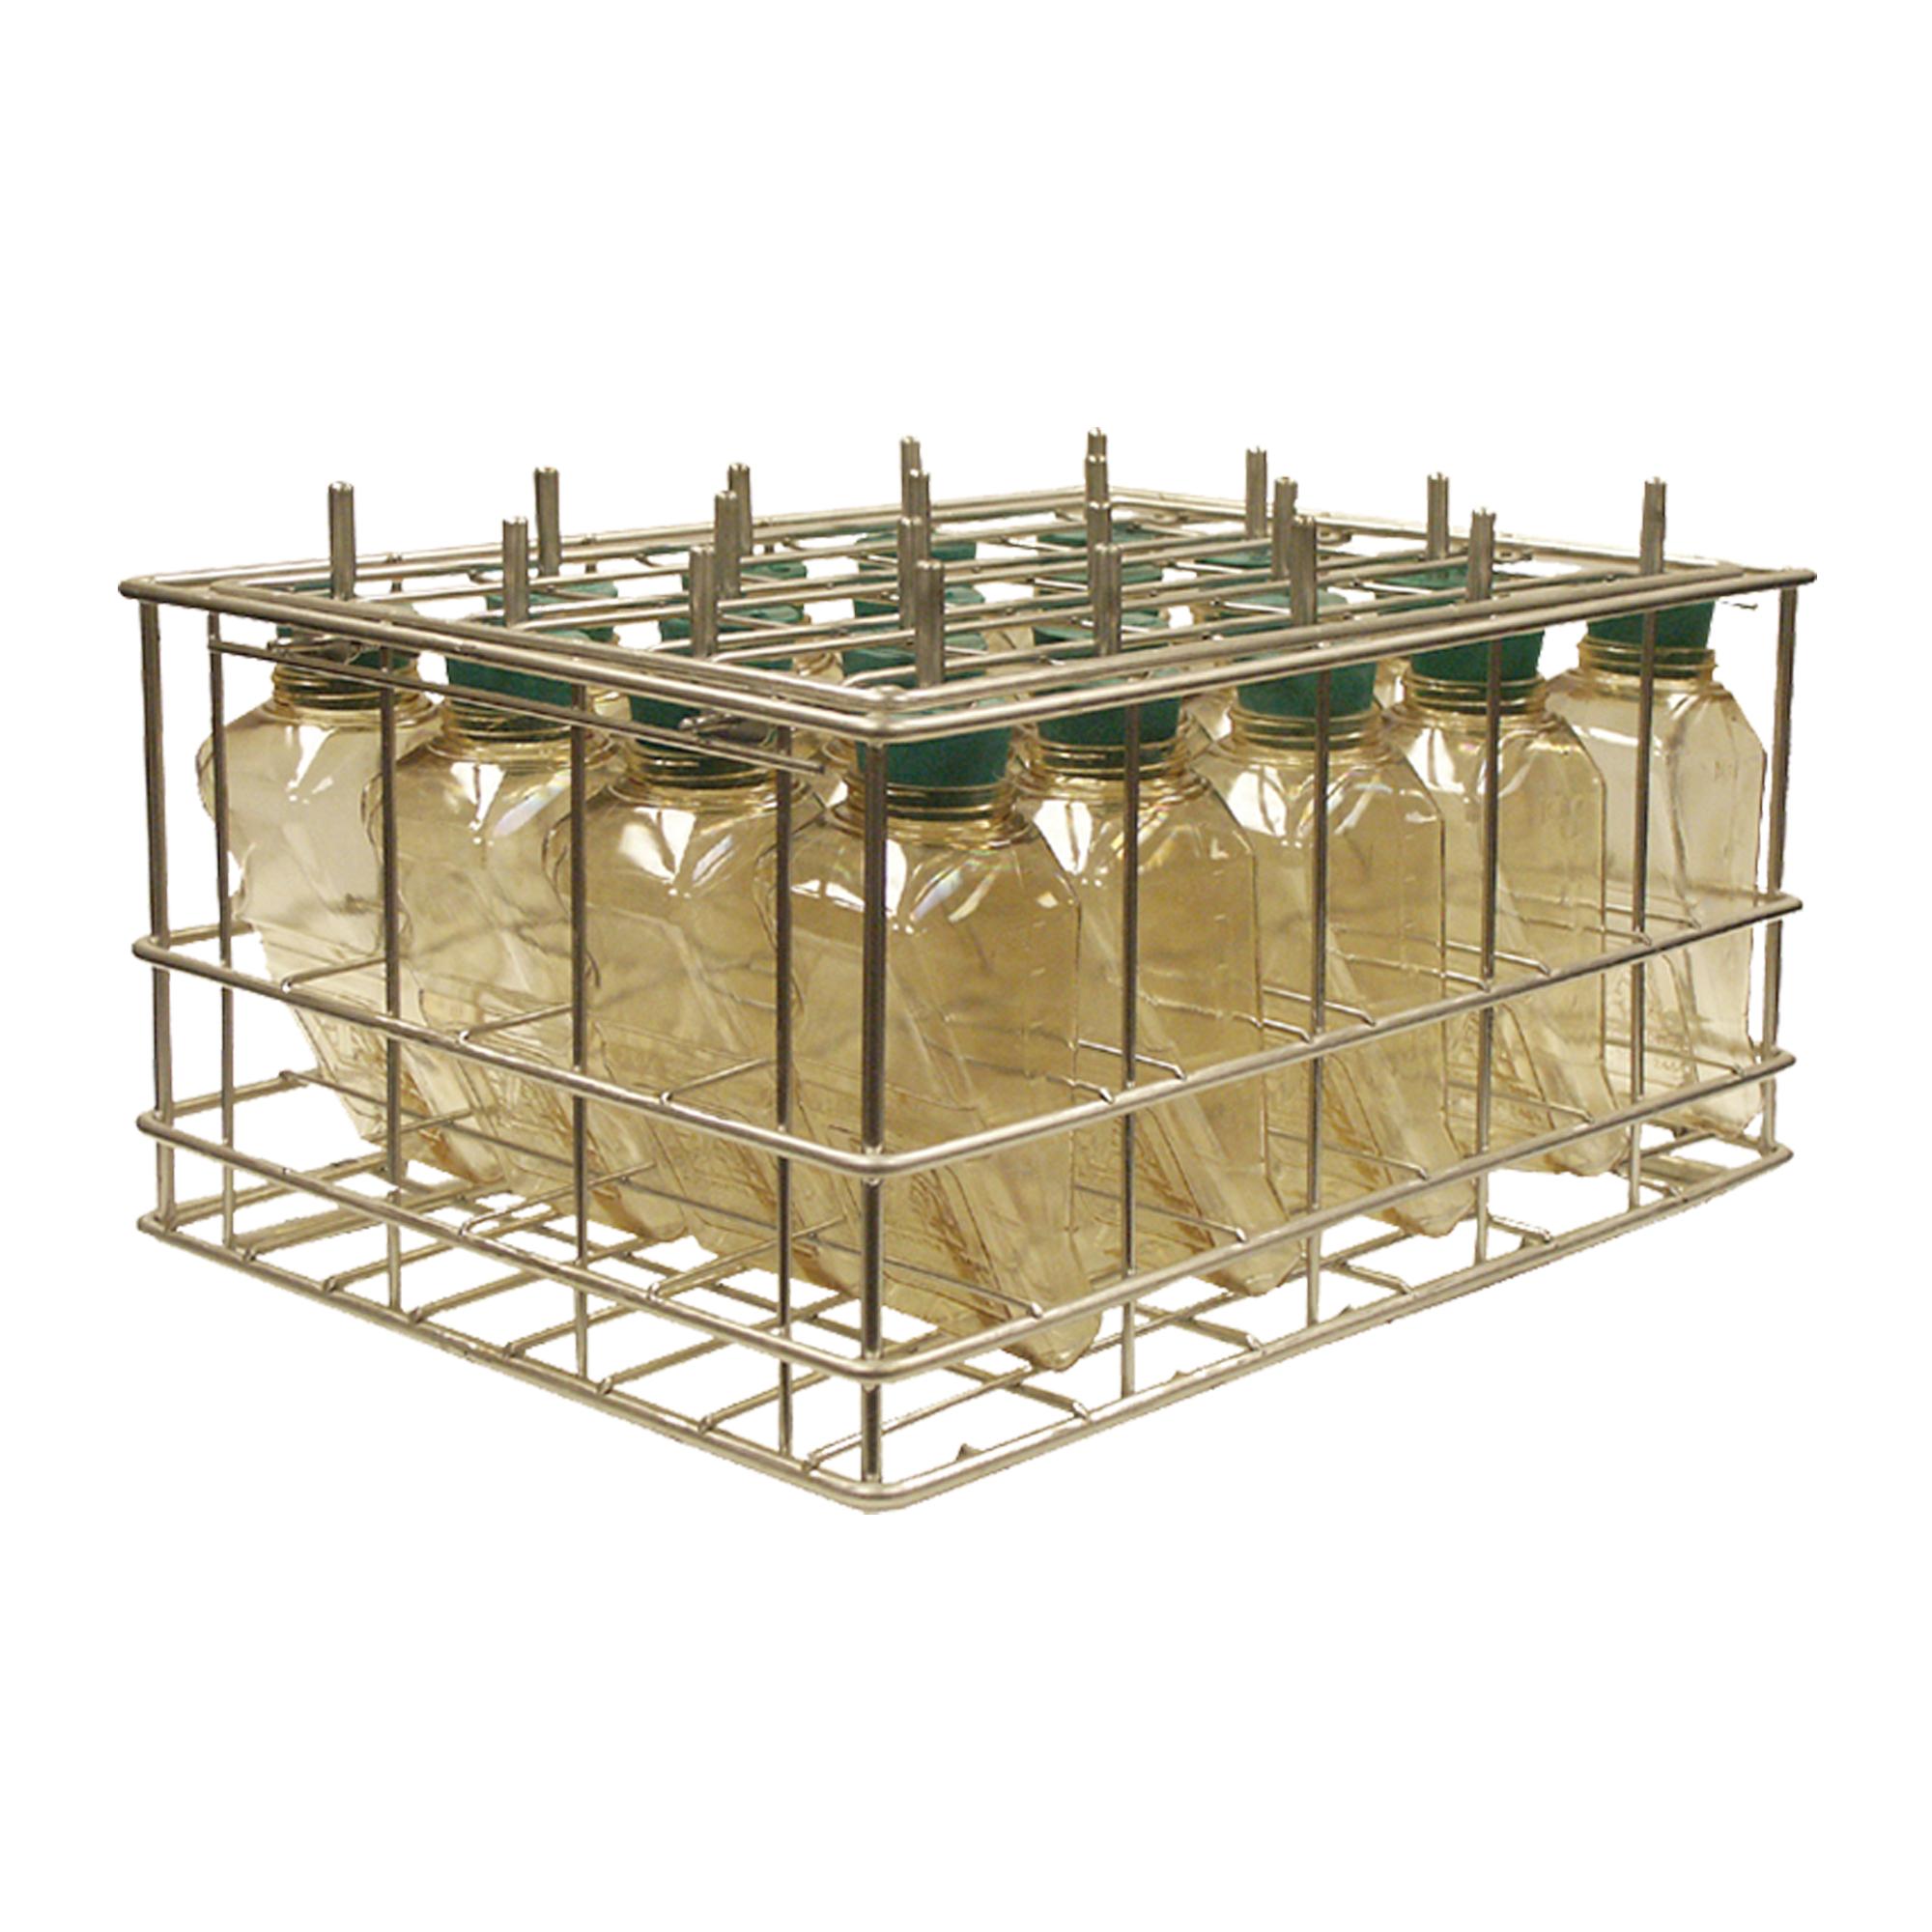 Low Profile Water Bottle Basket - Alternative Design